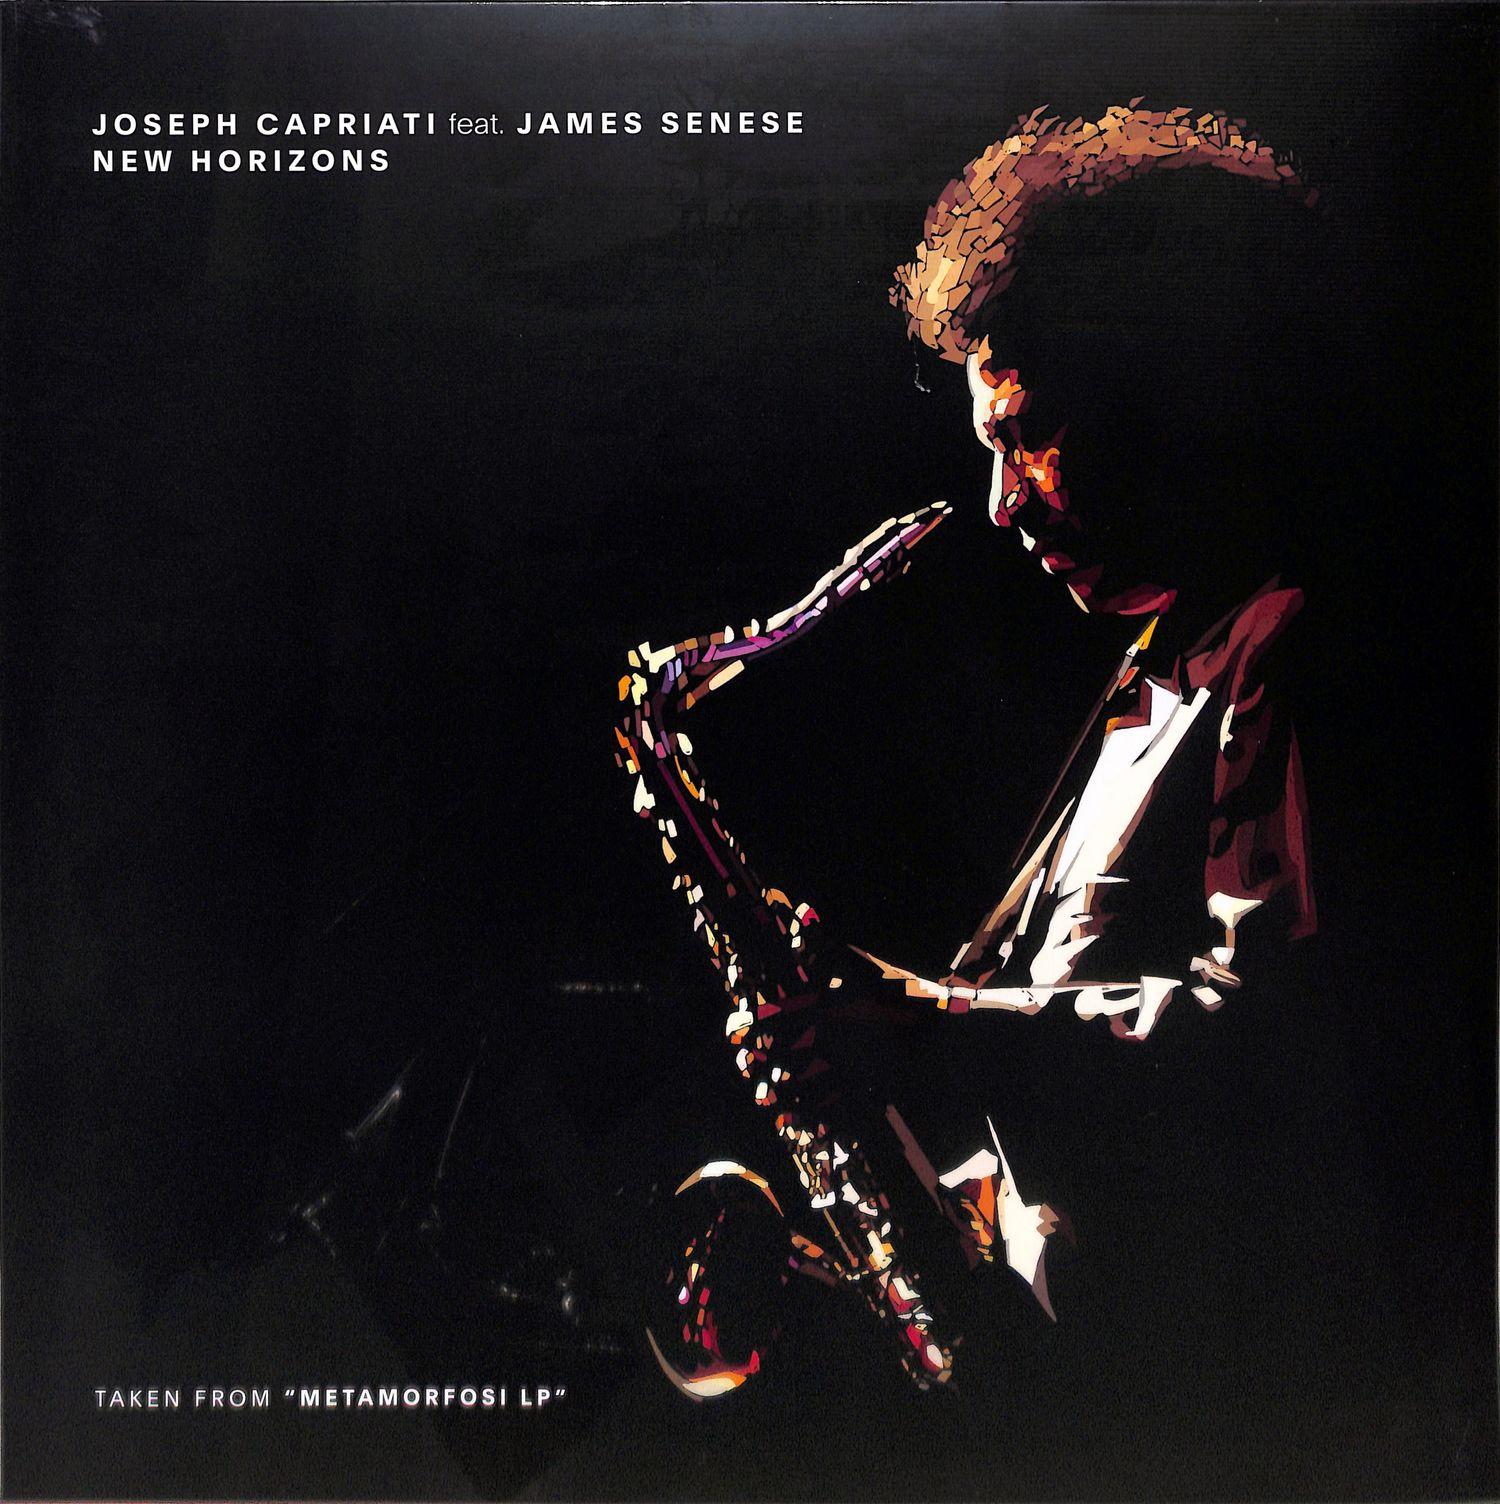 Joseph Capriati feat James Senese - NEW HORIZONS